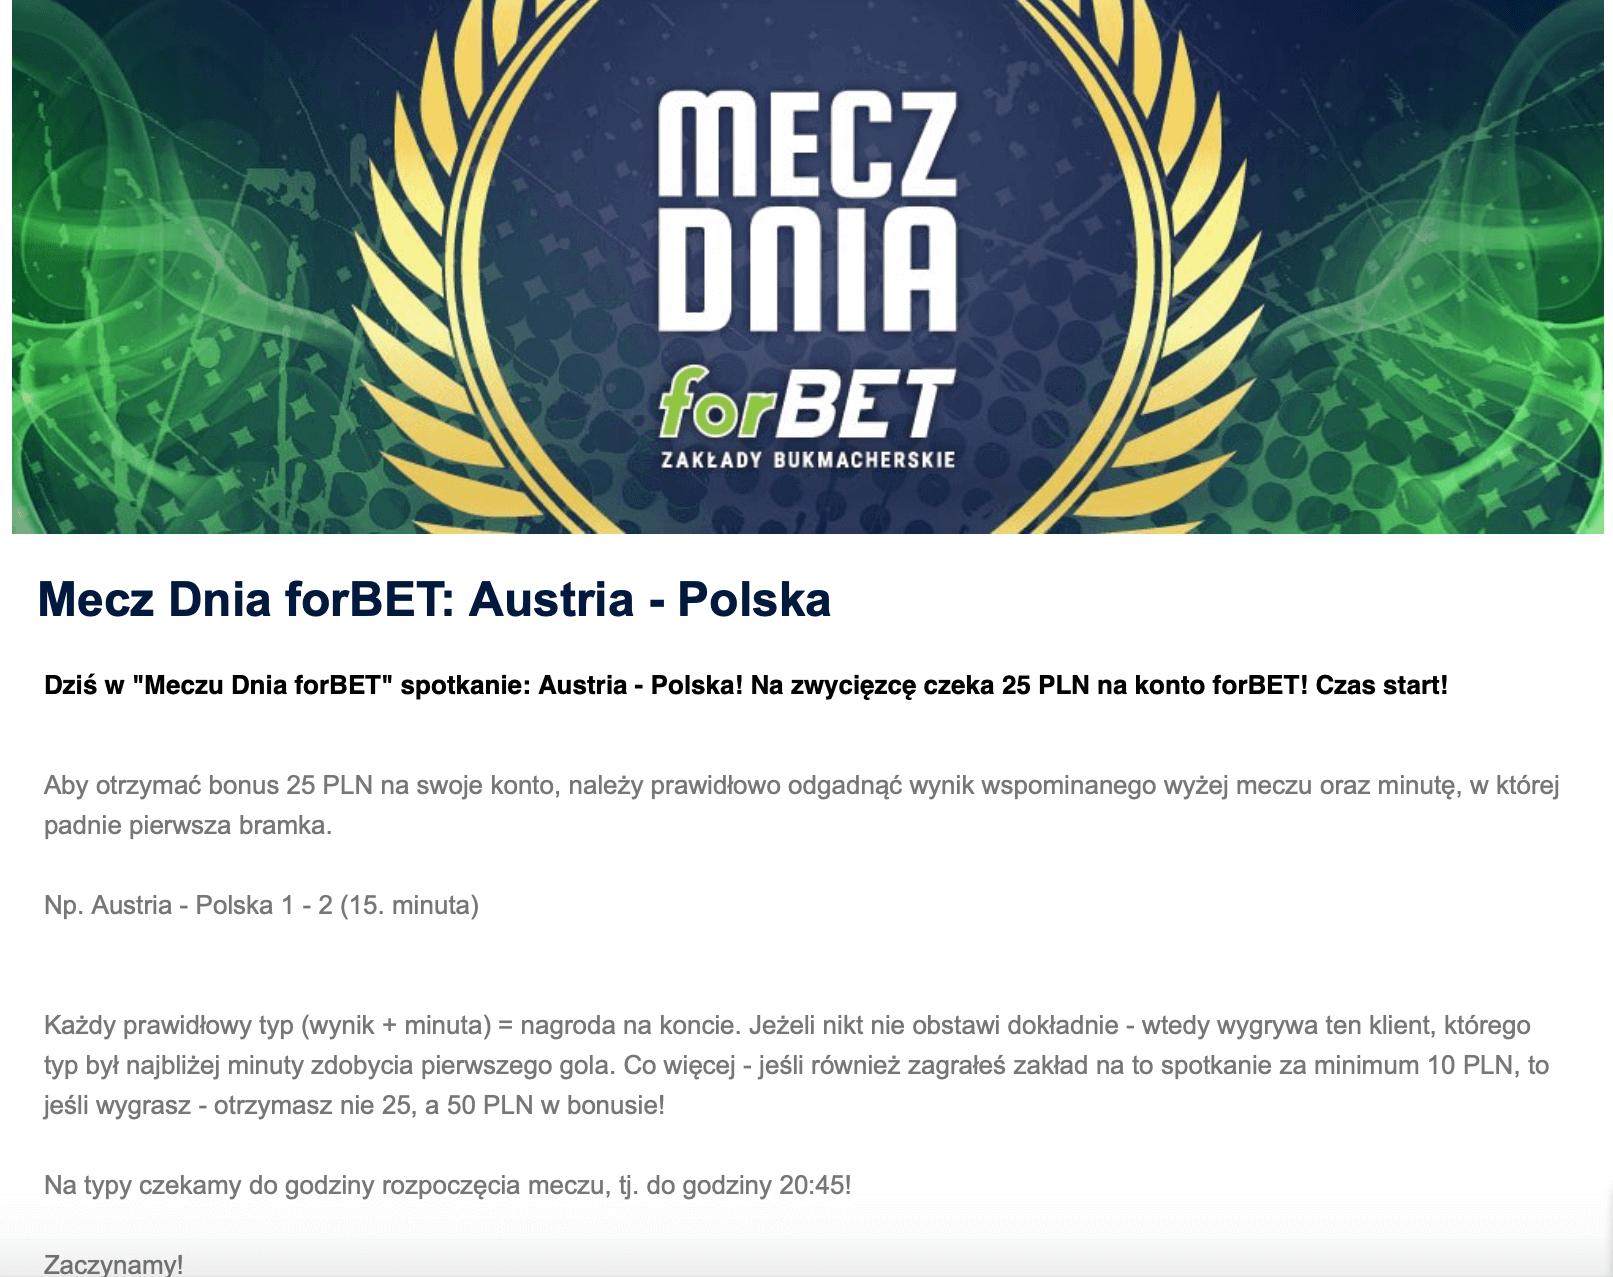 mecz dnia forbet polska austria